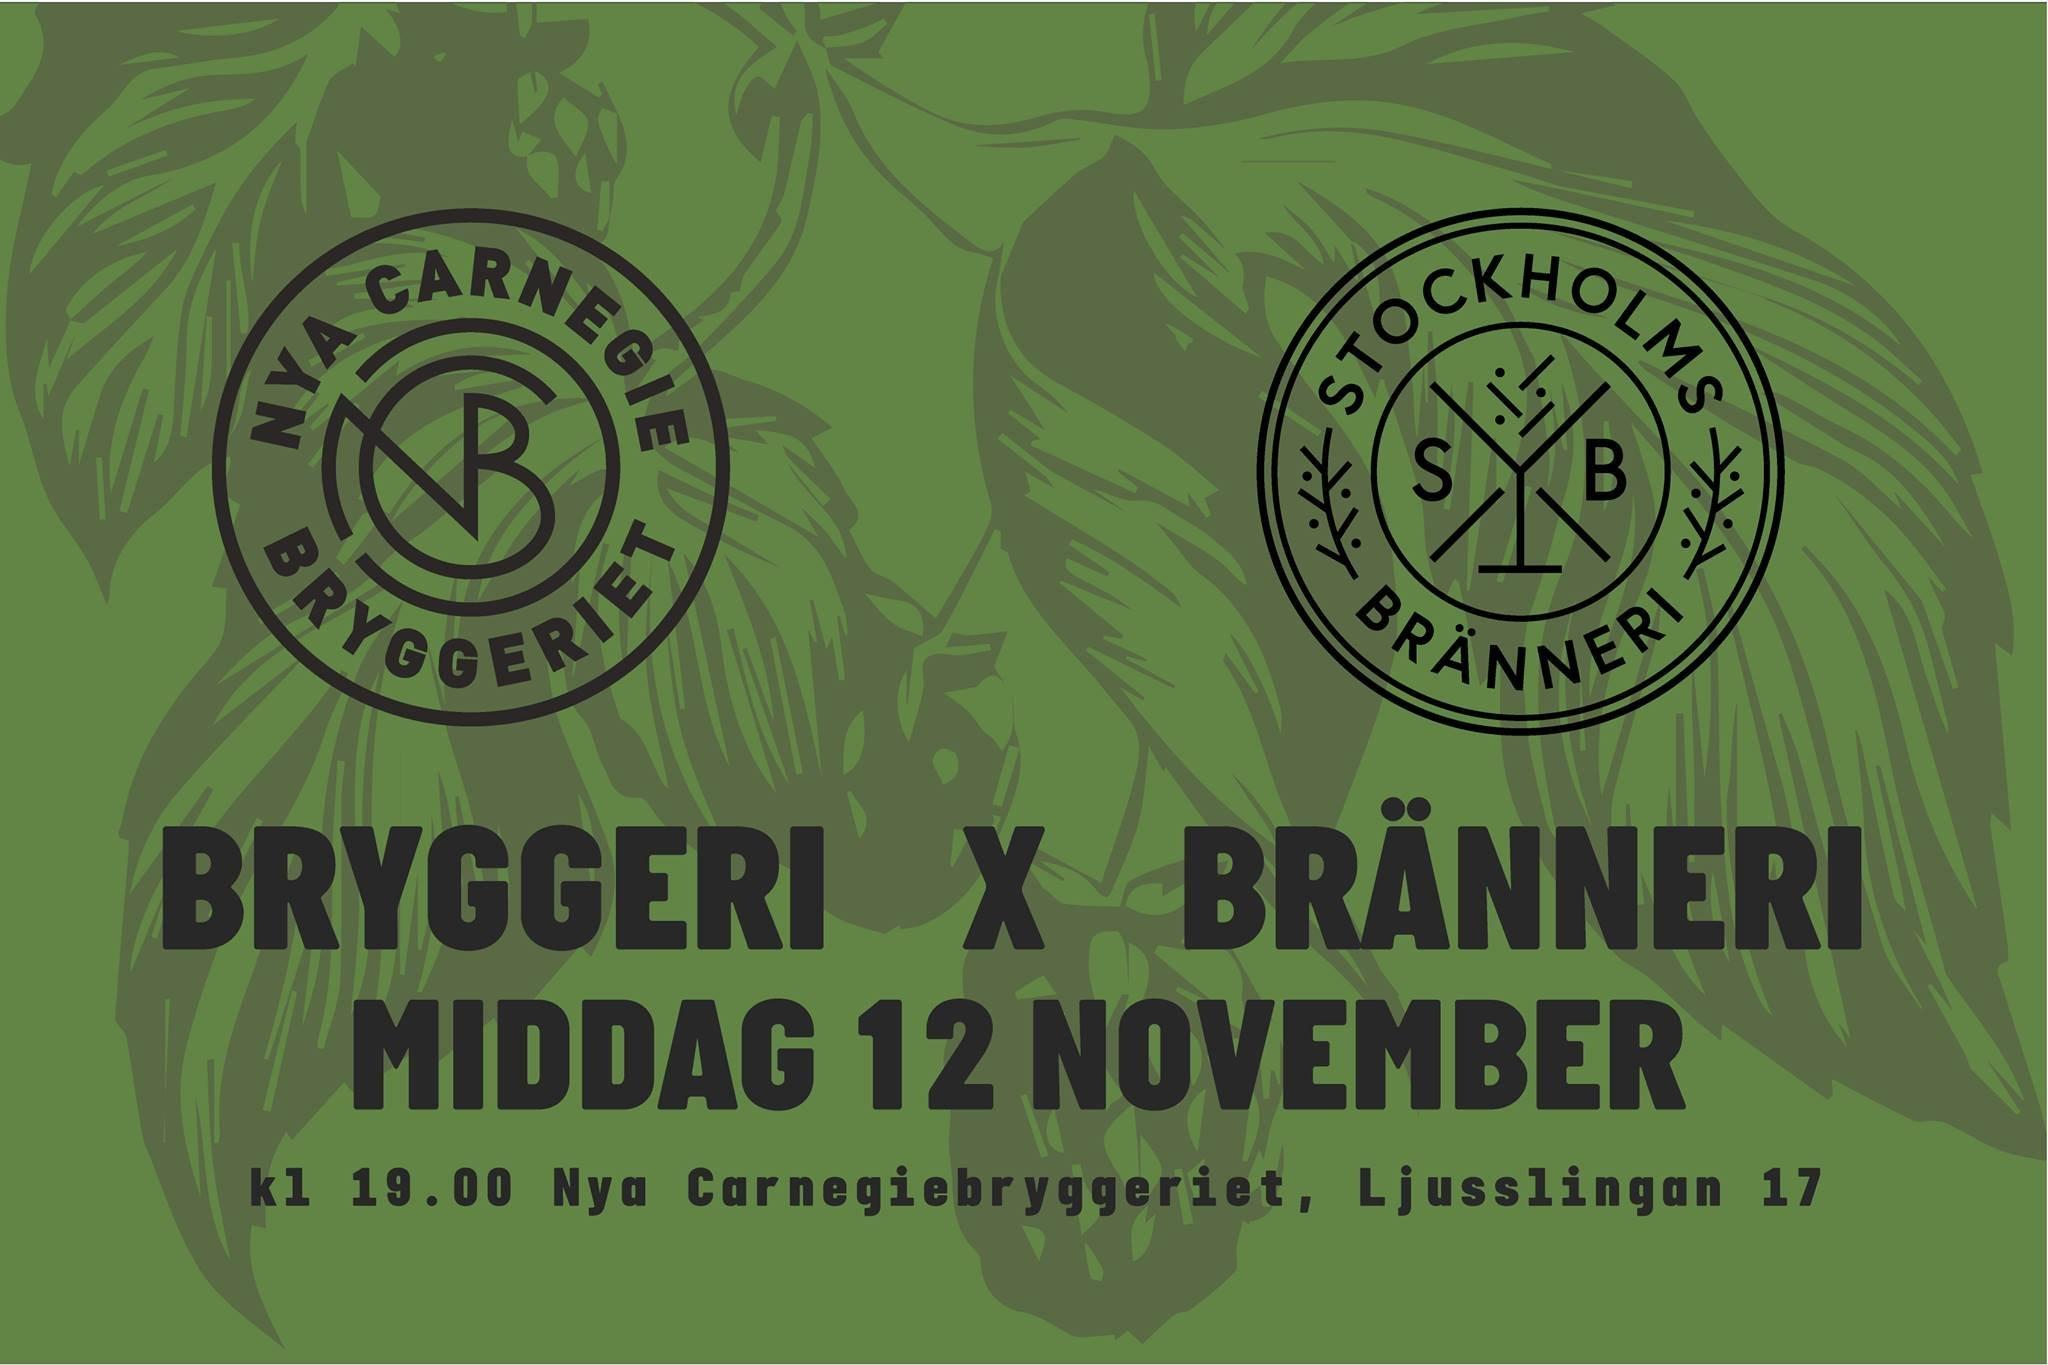 Bryggeri X Bränneri Dinner